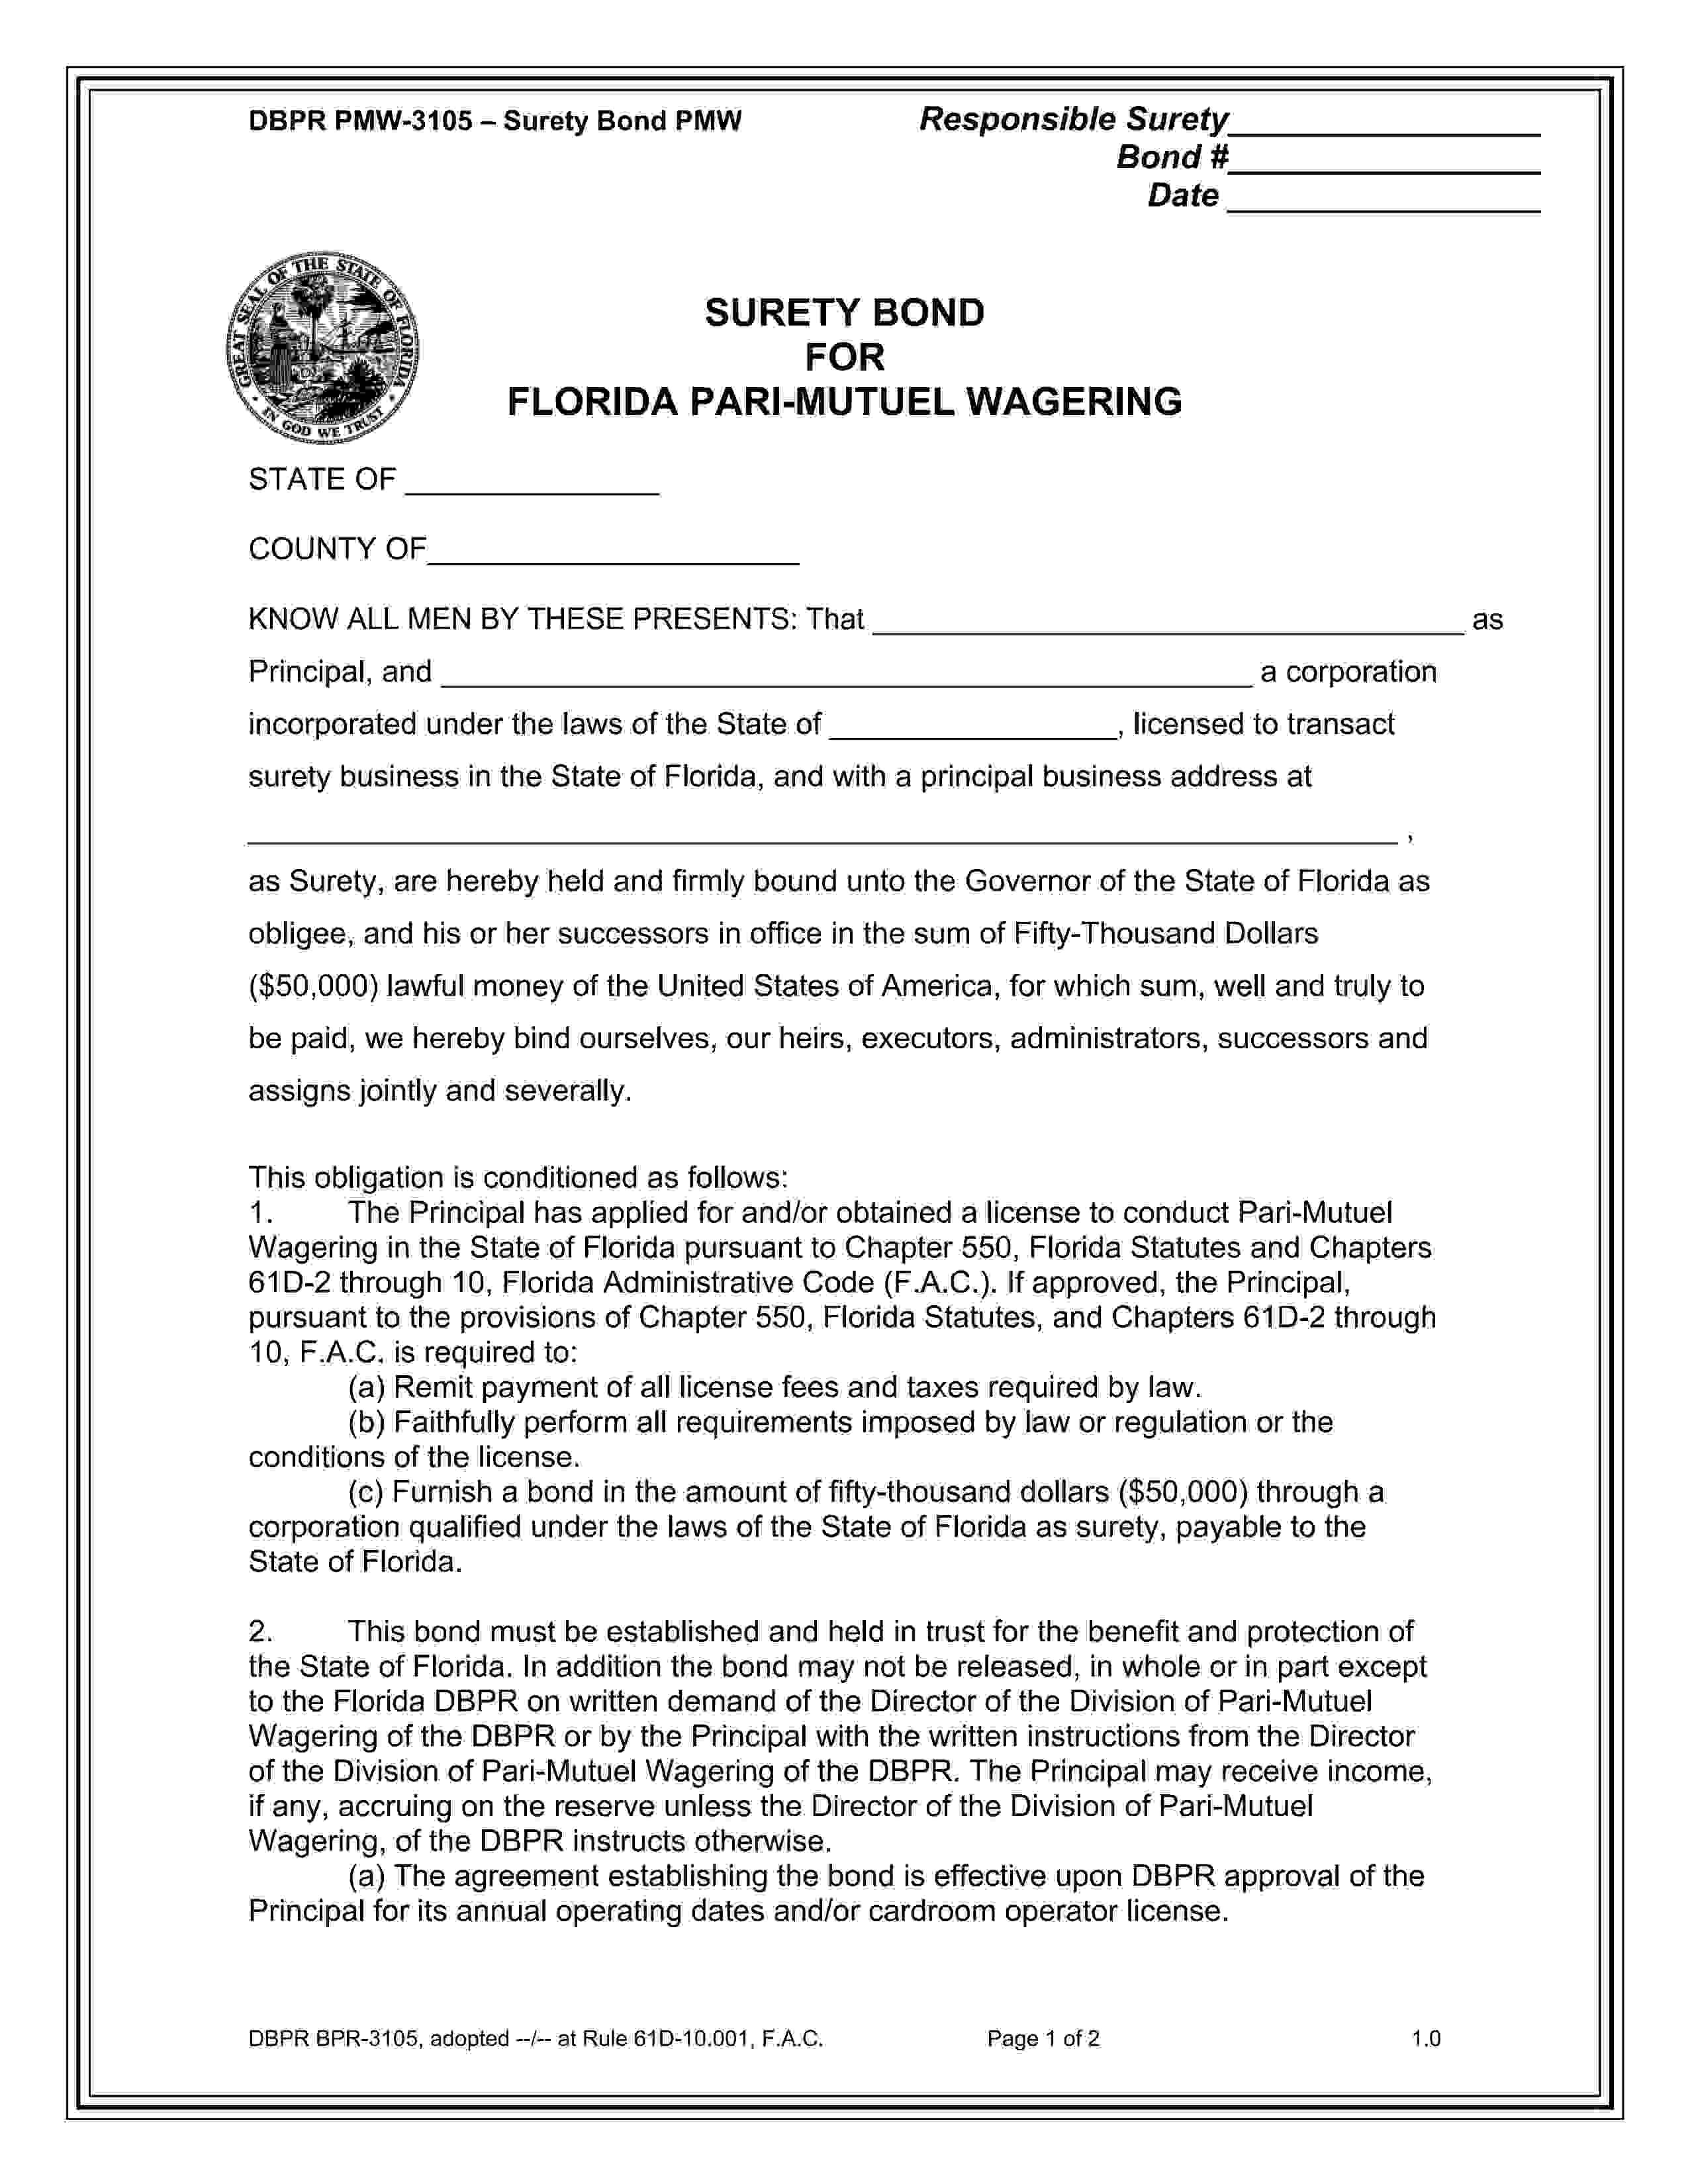 Florida Dbpr, Division Of Pari-Mutuel Wagering Pari-Mutuel Wagering Bond sample image